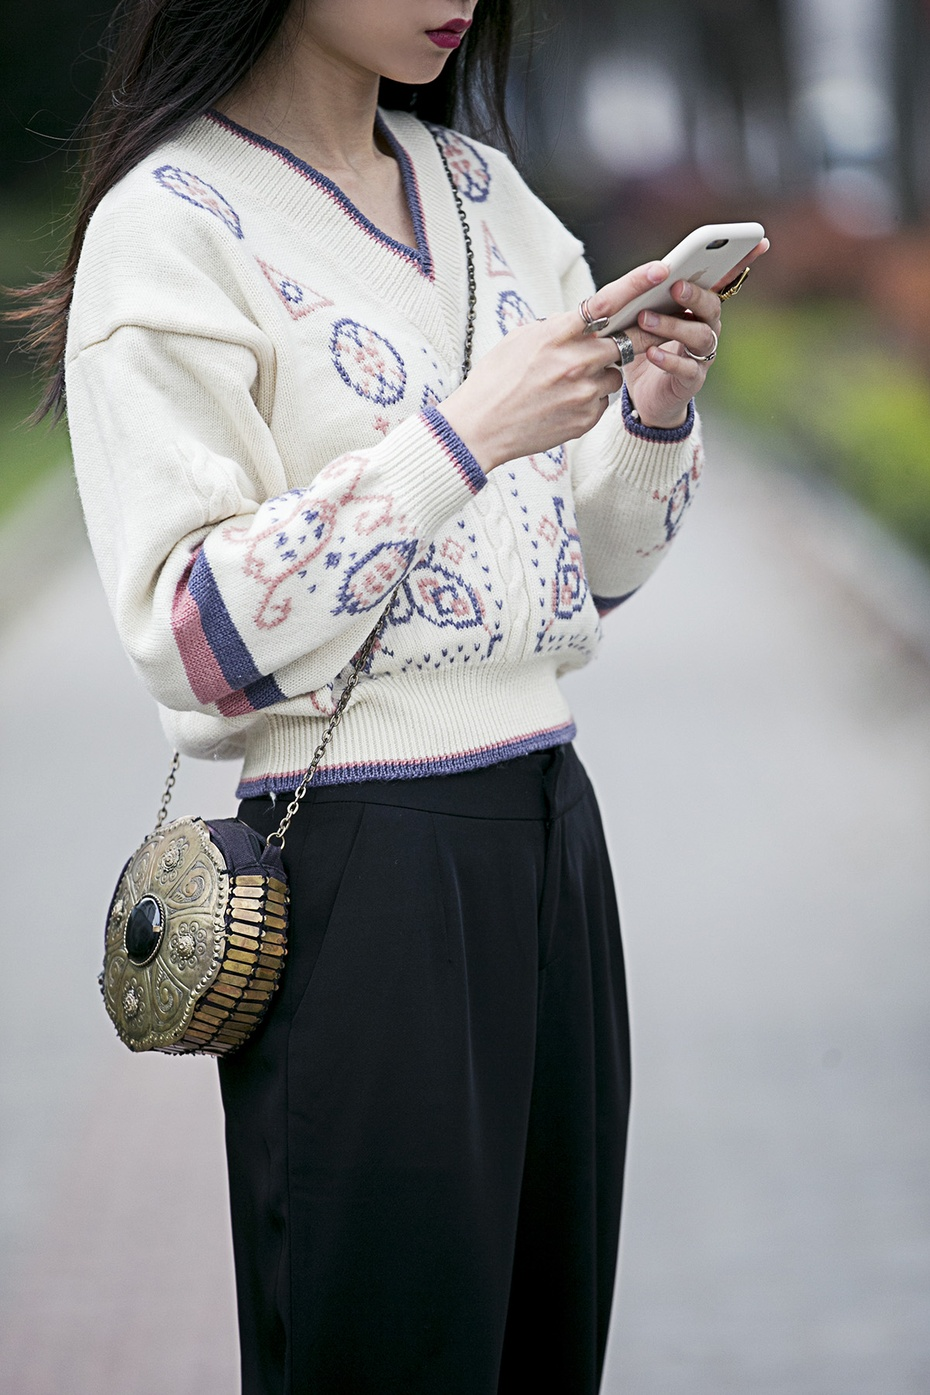 [Ava搭配日记]复古永不褪色,静静的怀旧时光 - AvaFoo - Avas Fashion Blog